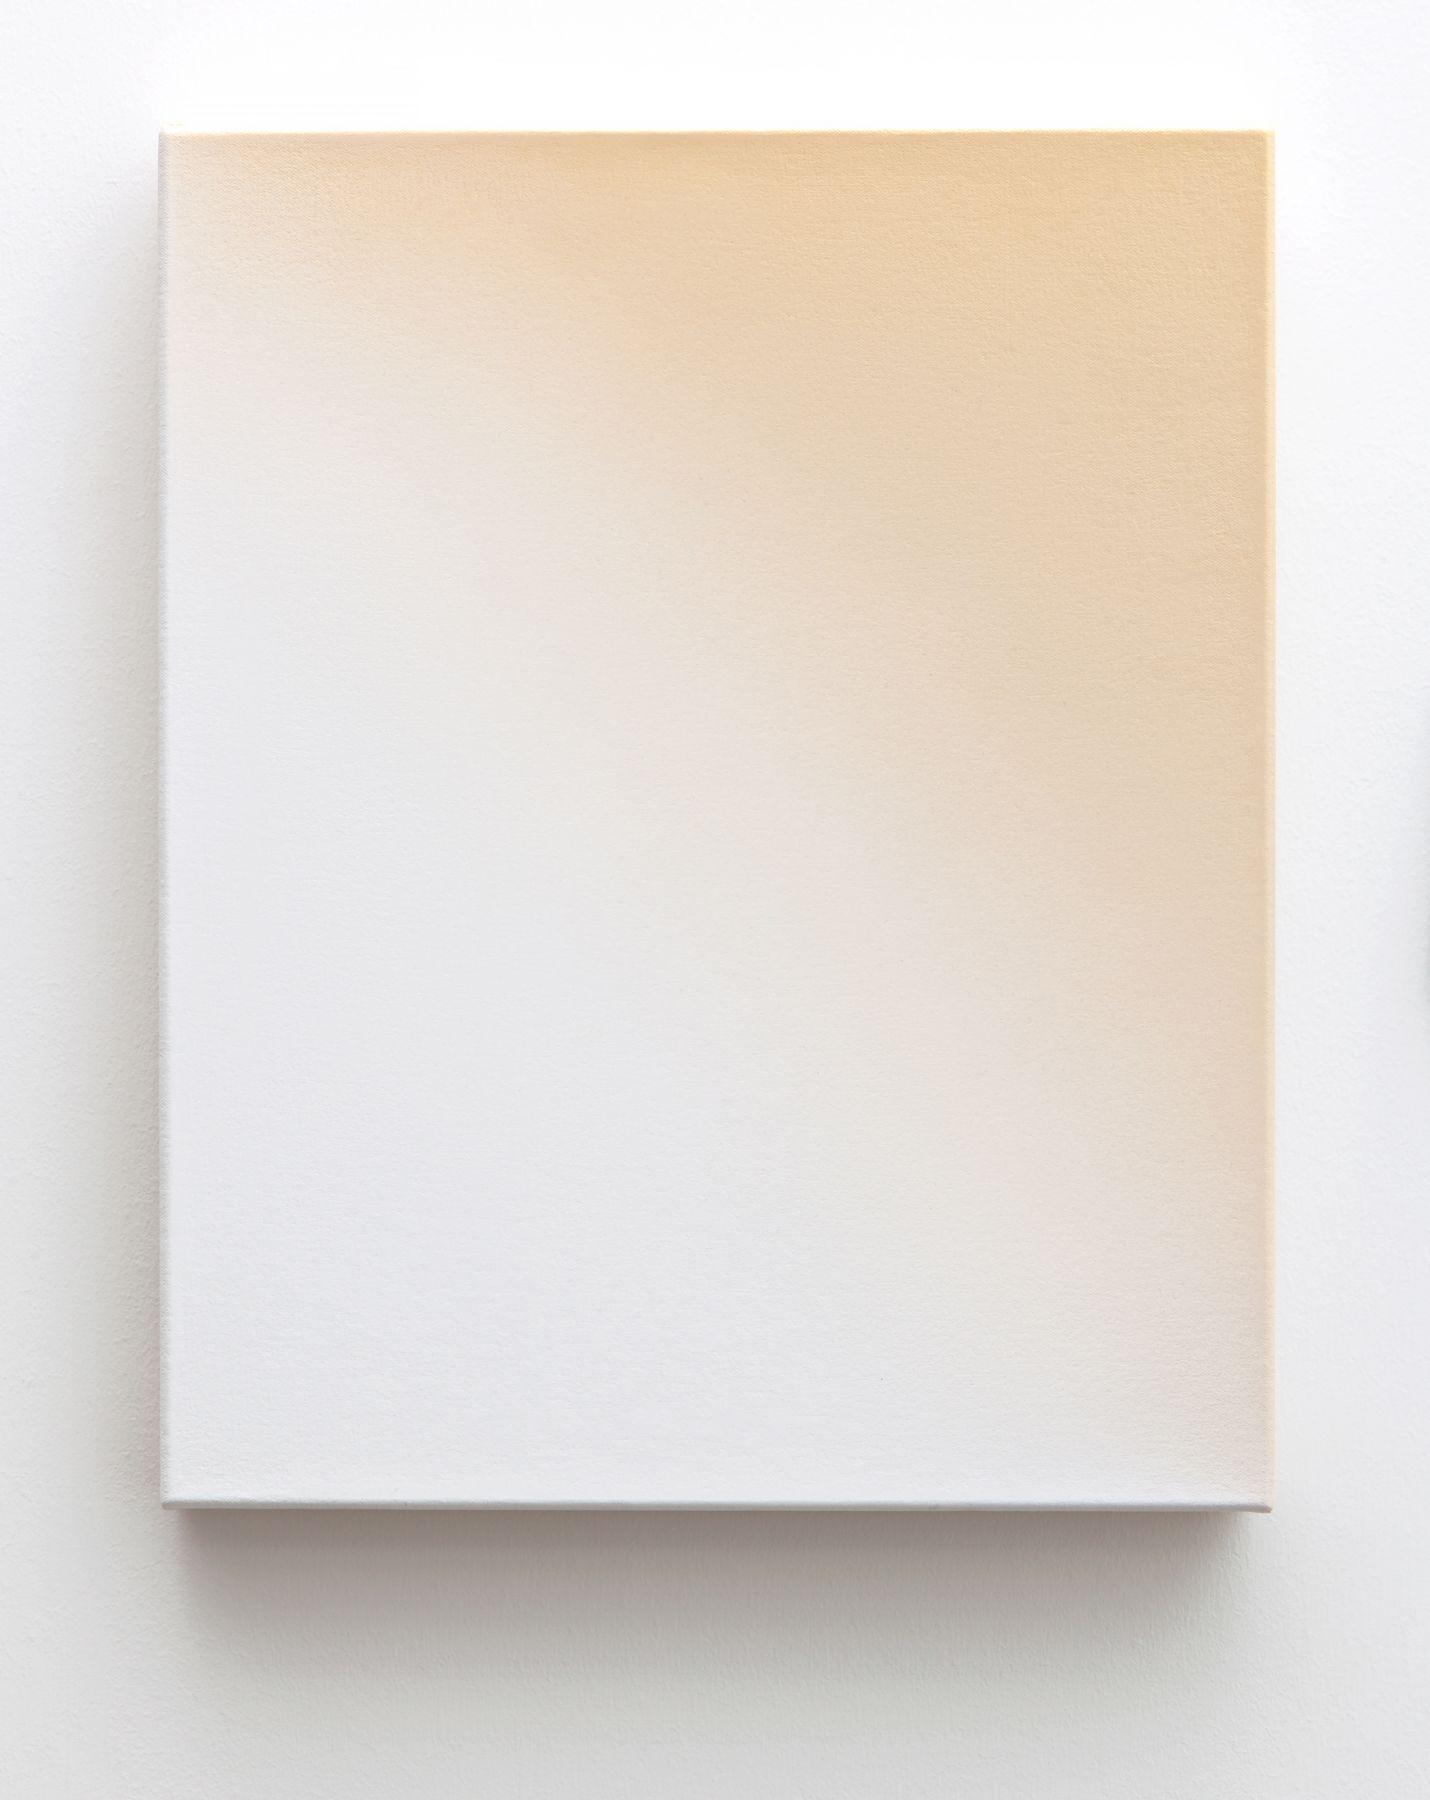 Kristen Cliburn, Inseparables II, 2014